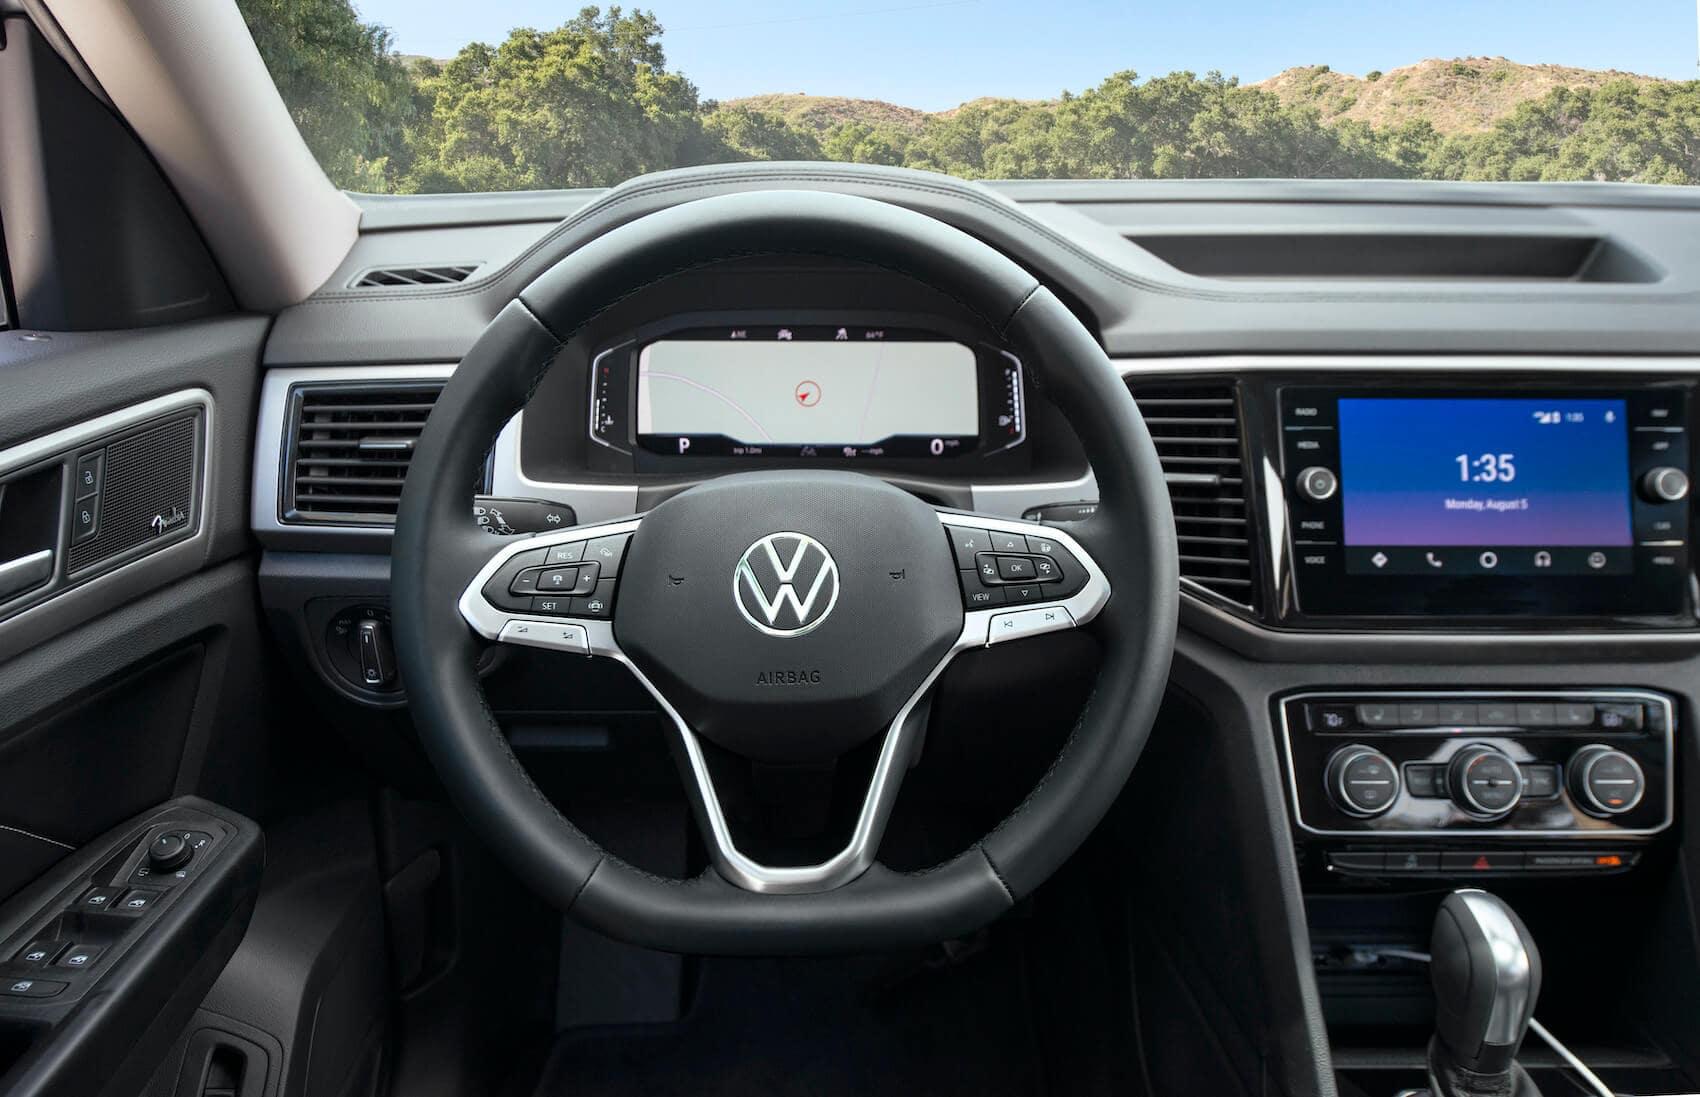 2021 Volkswagen Atlas vs 2021 Subaru Ascent